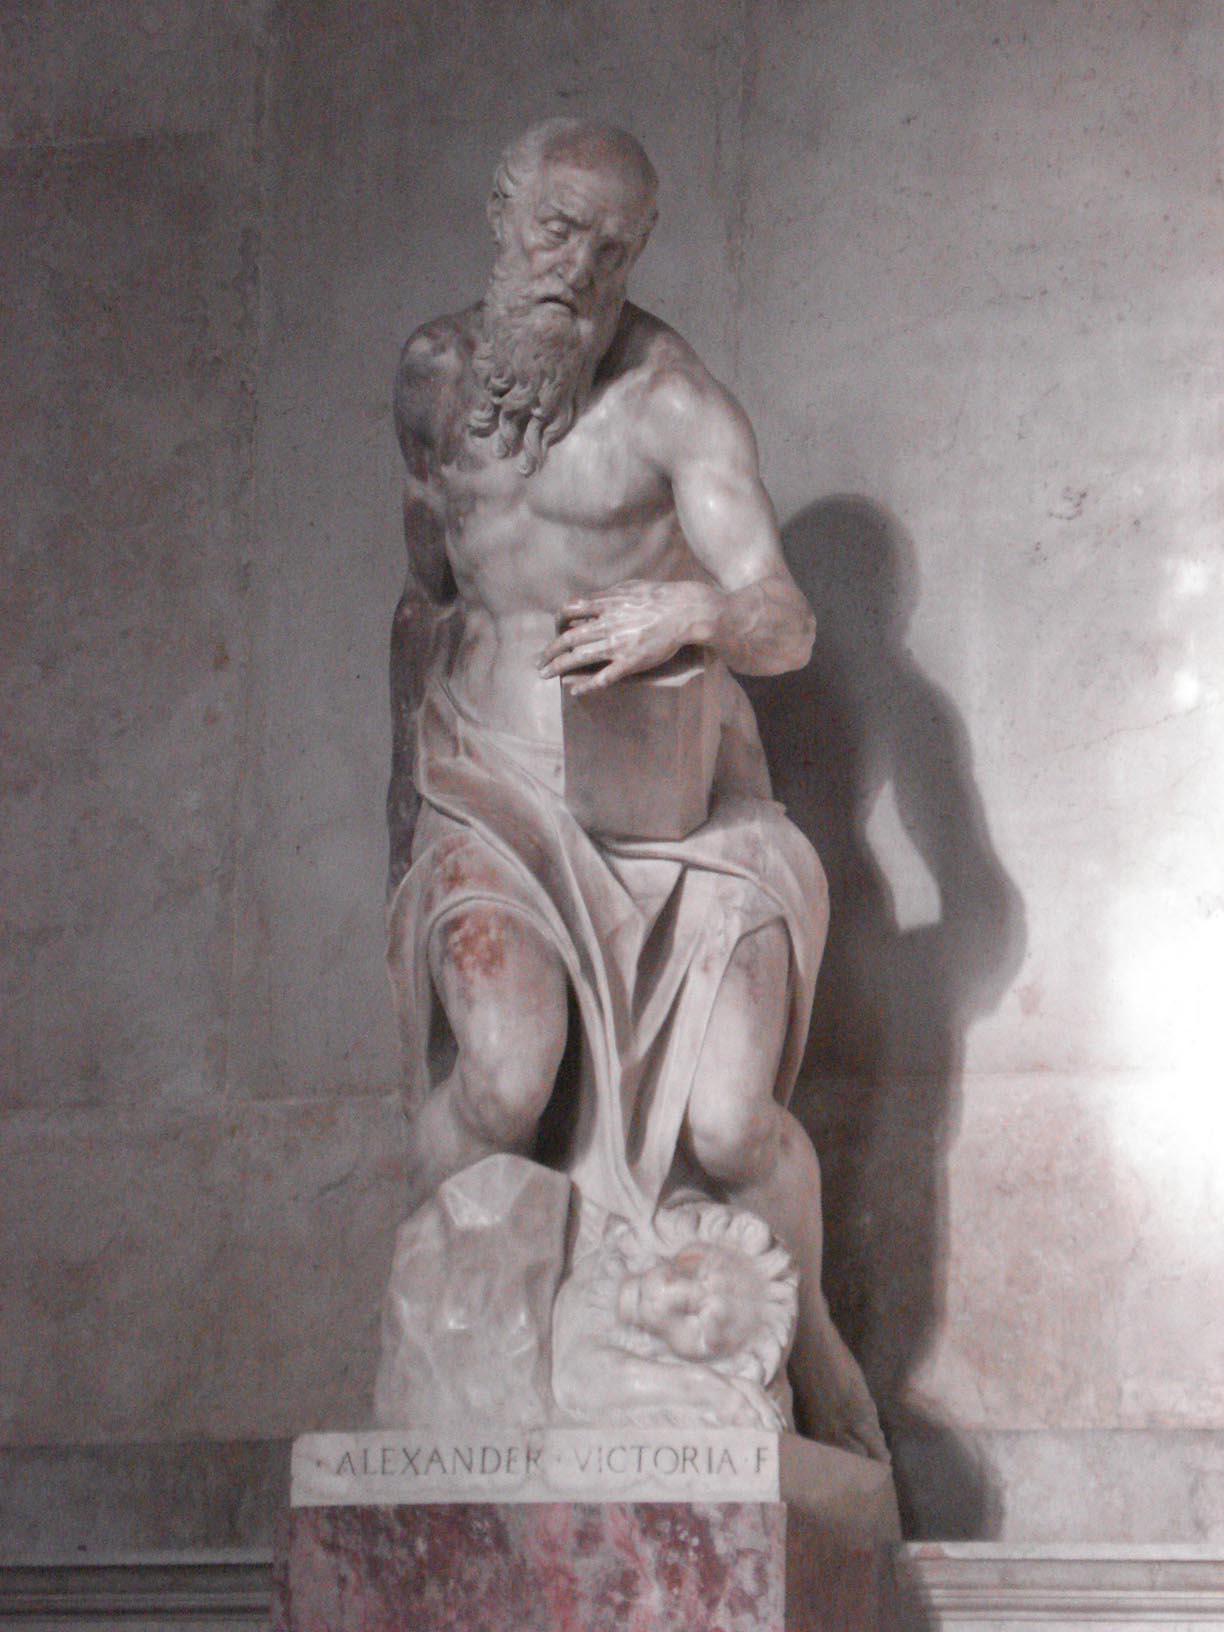 027-Св. Иероним (А.Витториа)